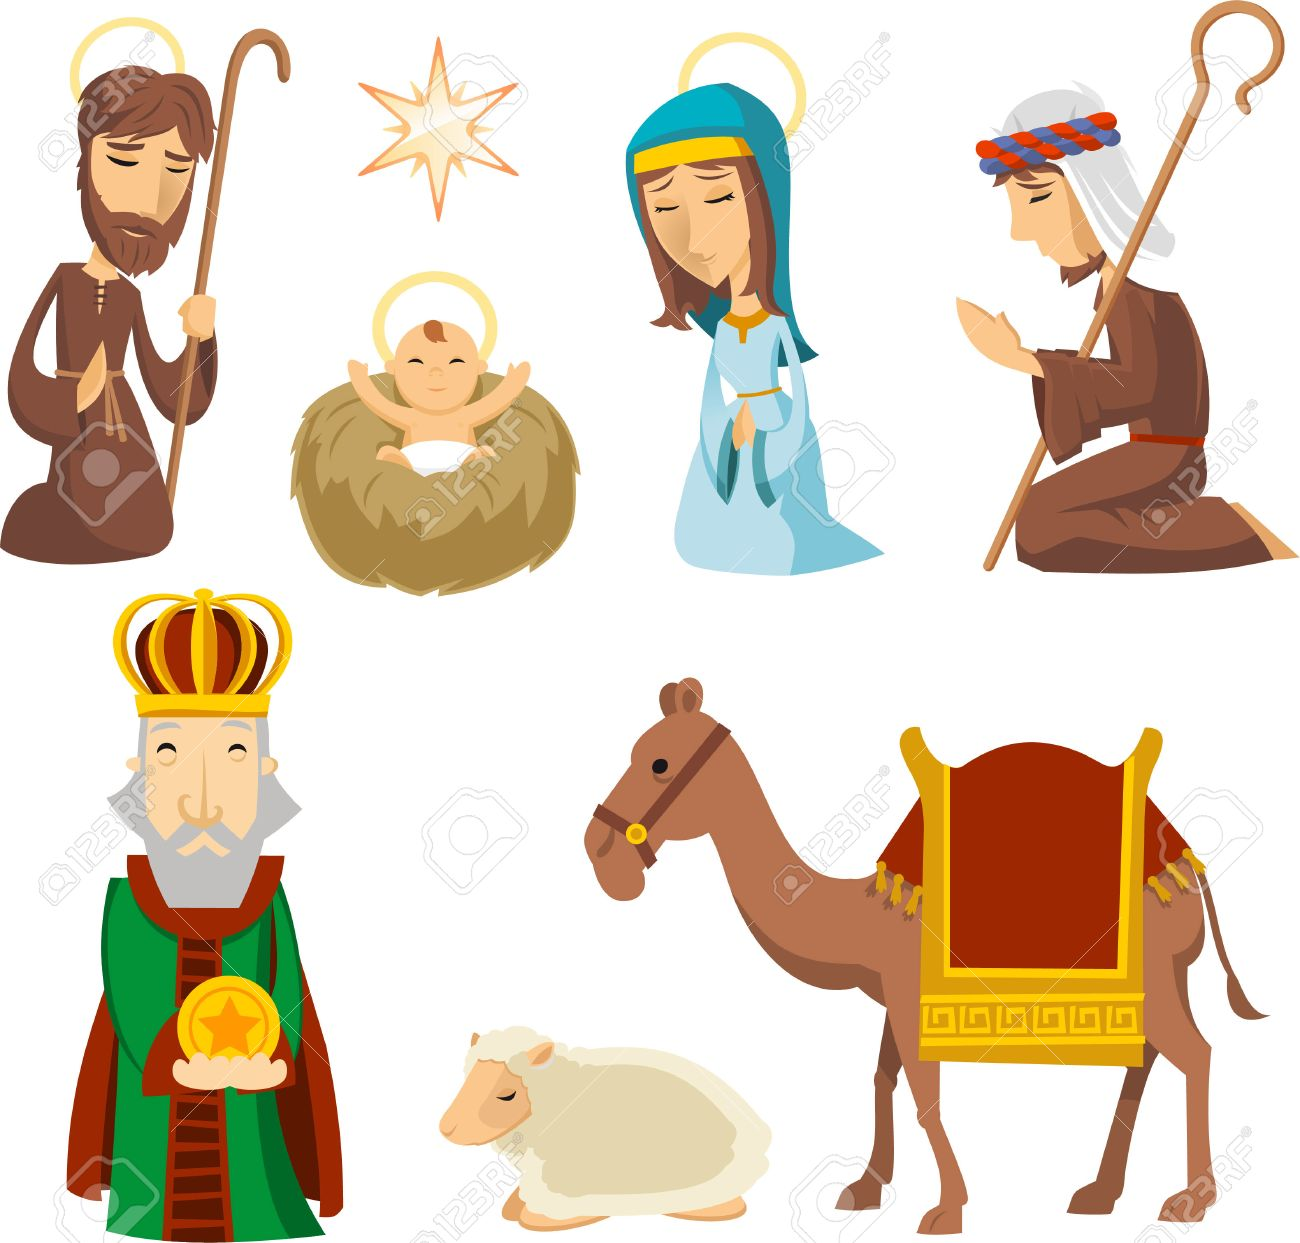 Nativity scene characters illustrations.